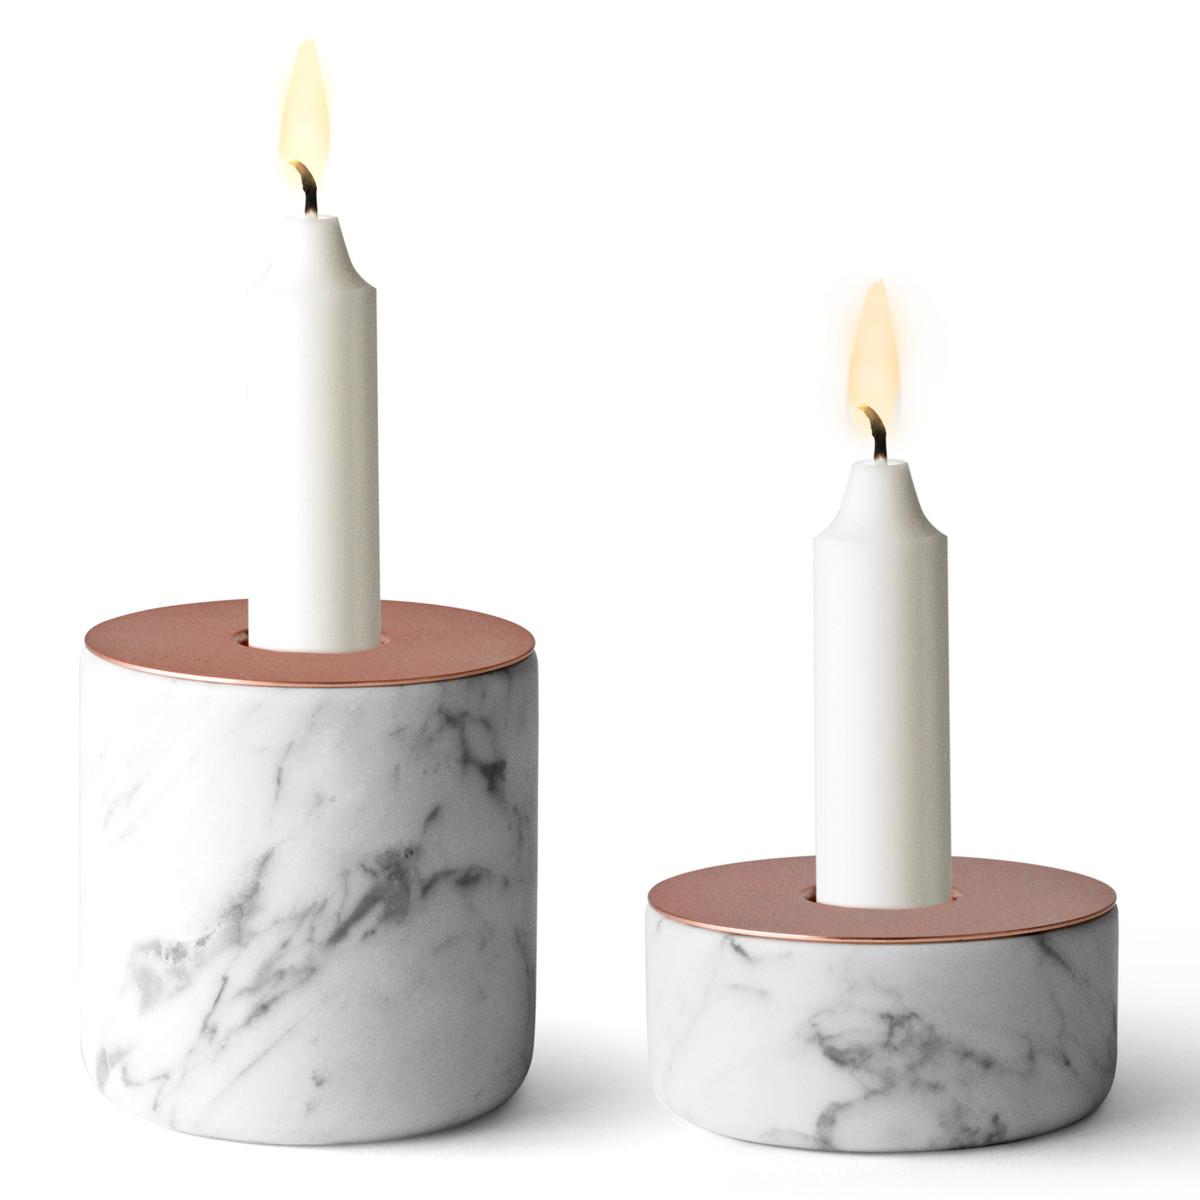 Chunk-of-Marble-beide-Groessen-mit-Kerzen